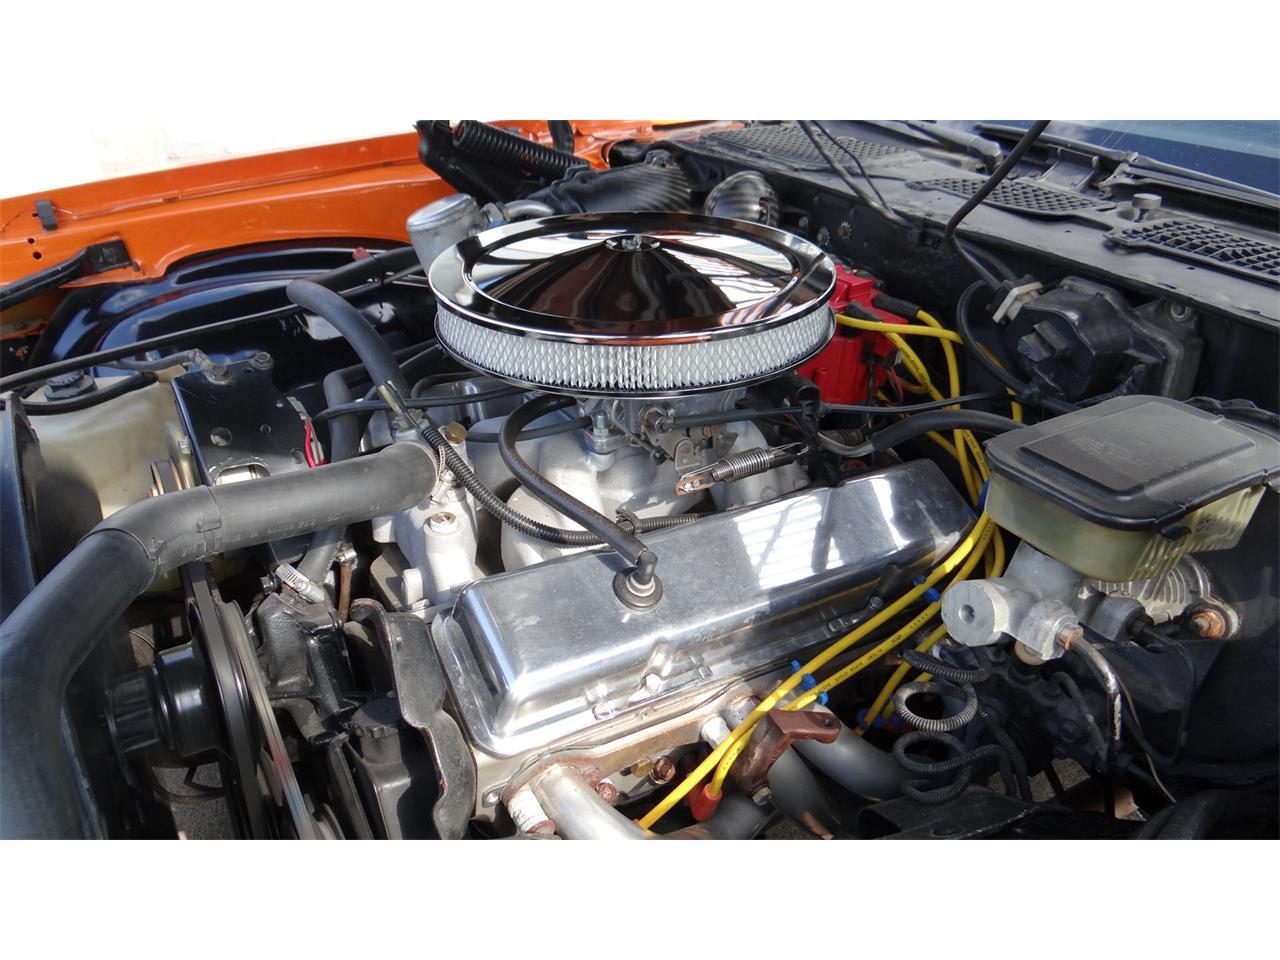 Large Picture of '81 Chevrolet Camaro Z28 Offered by Klemme Klassic Kars - LRQM